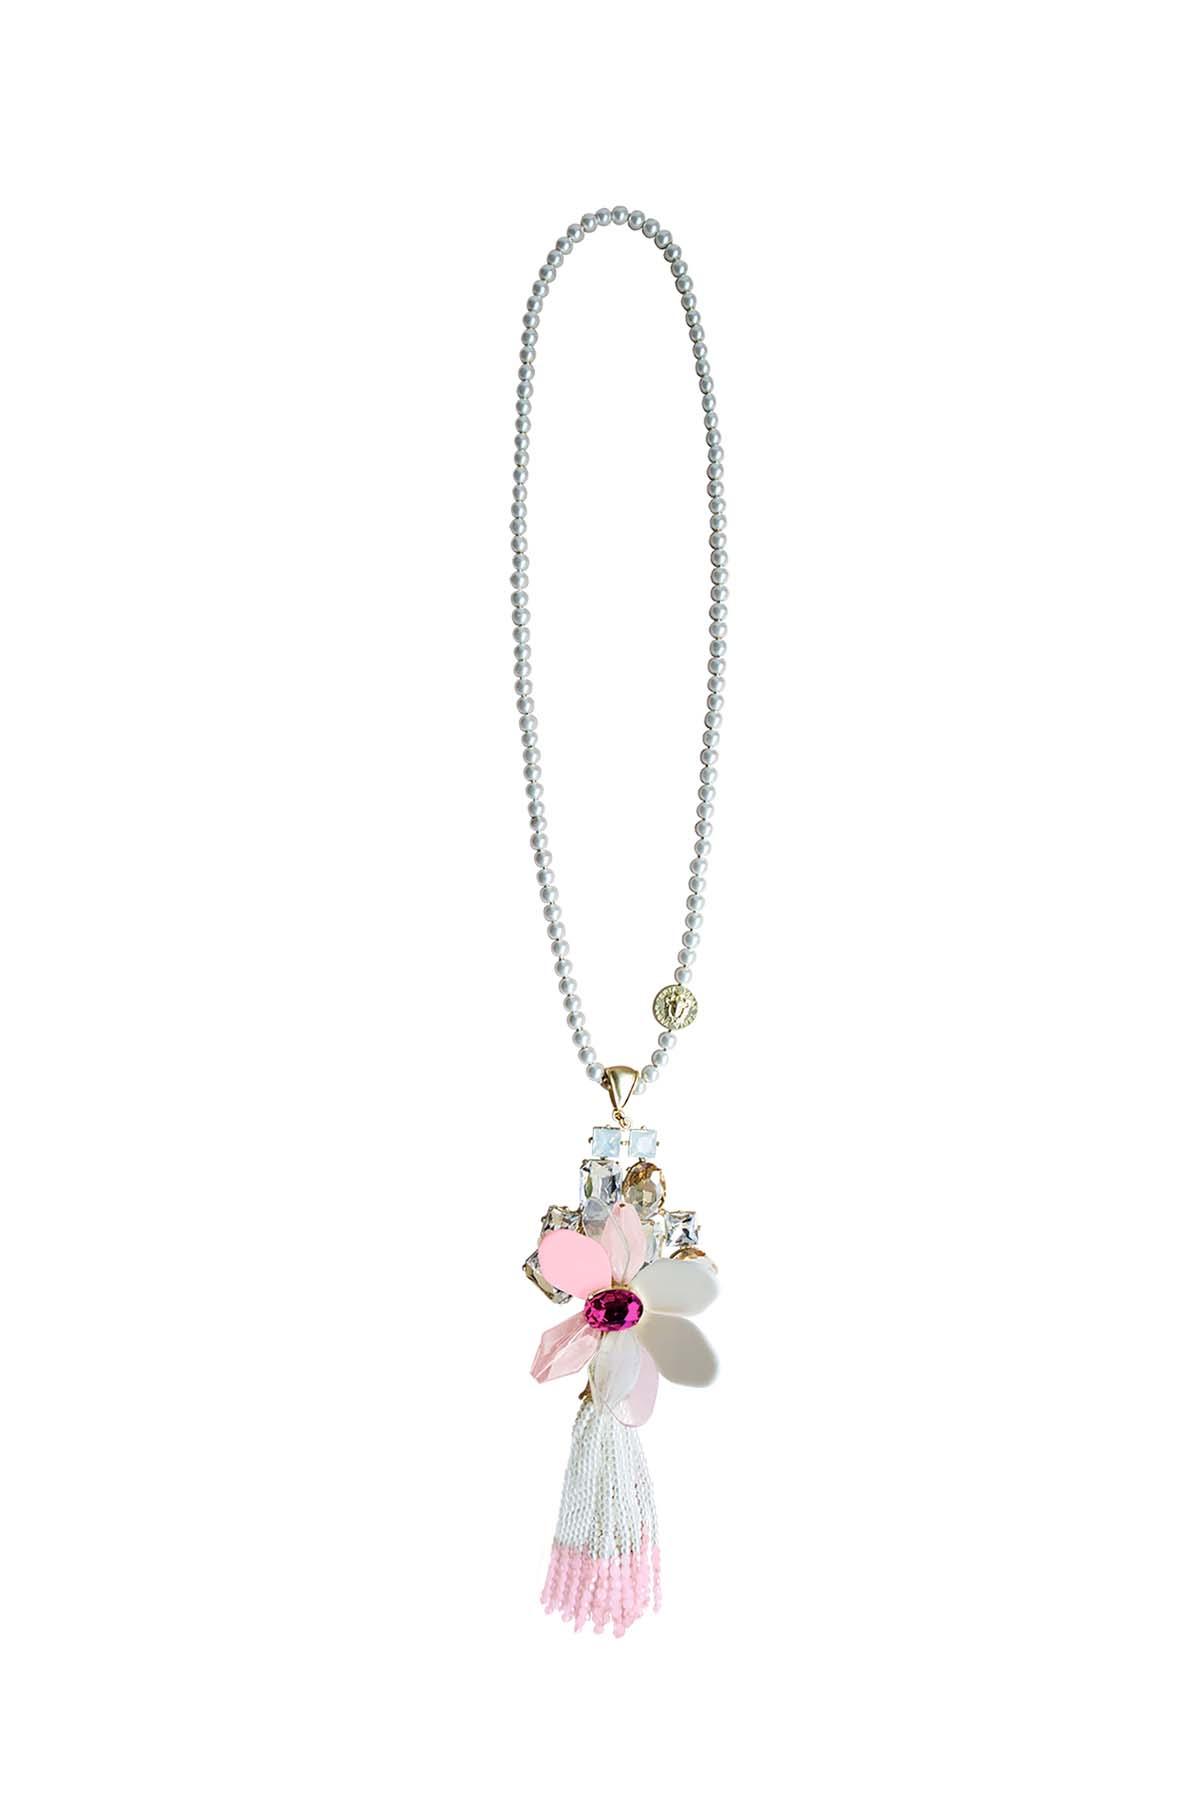 Teria Yabar - Collar largo con flor rosa